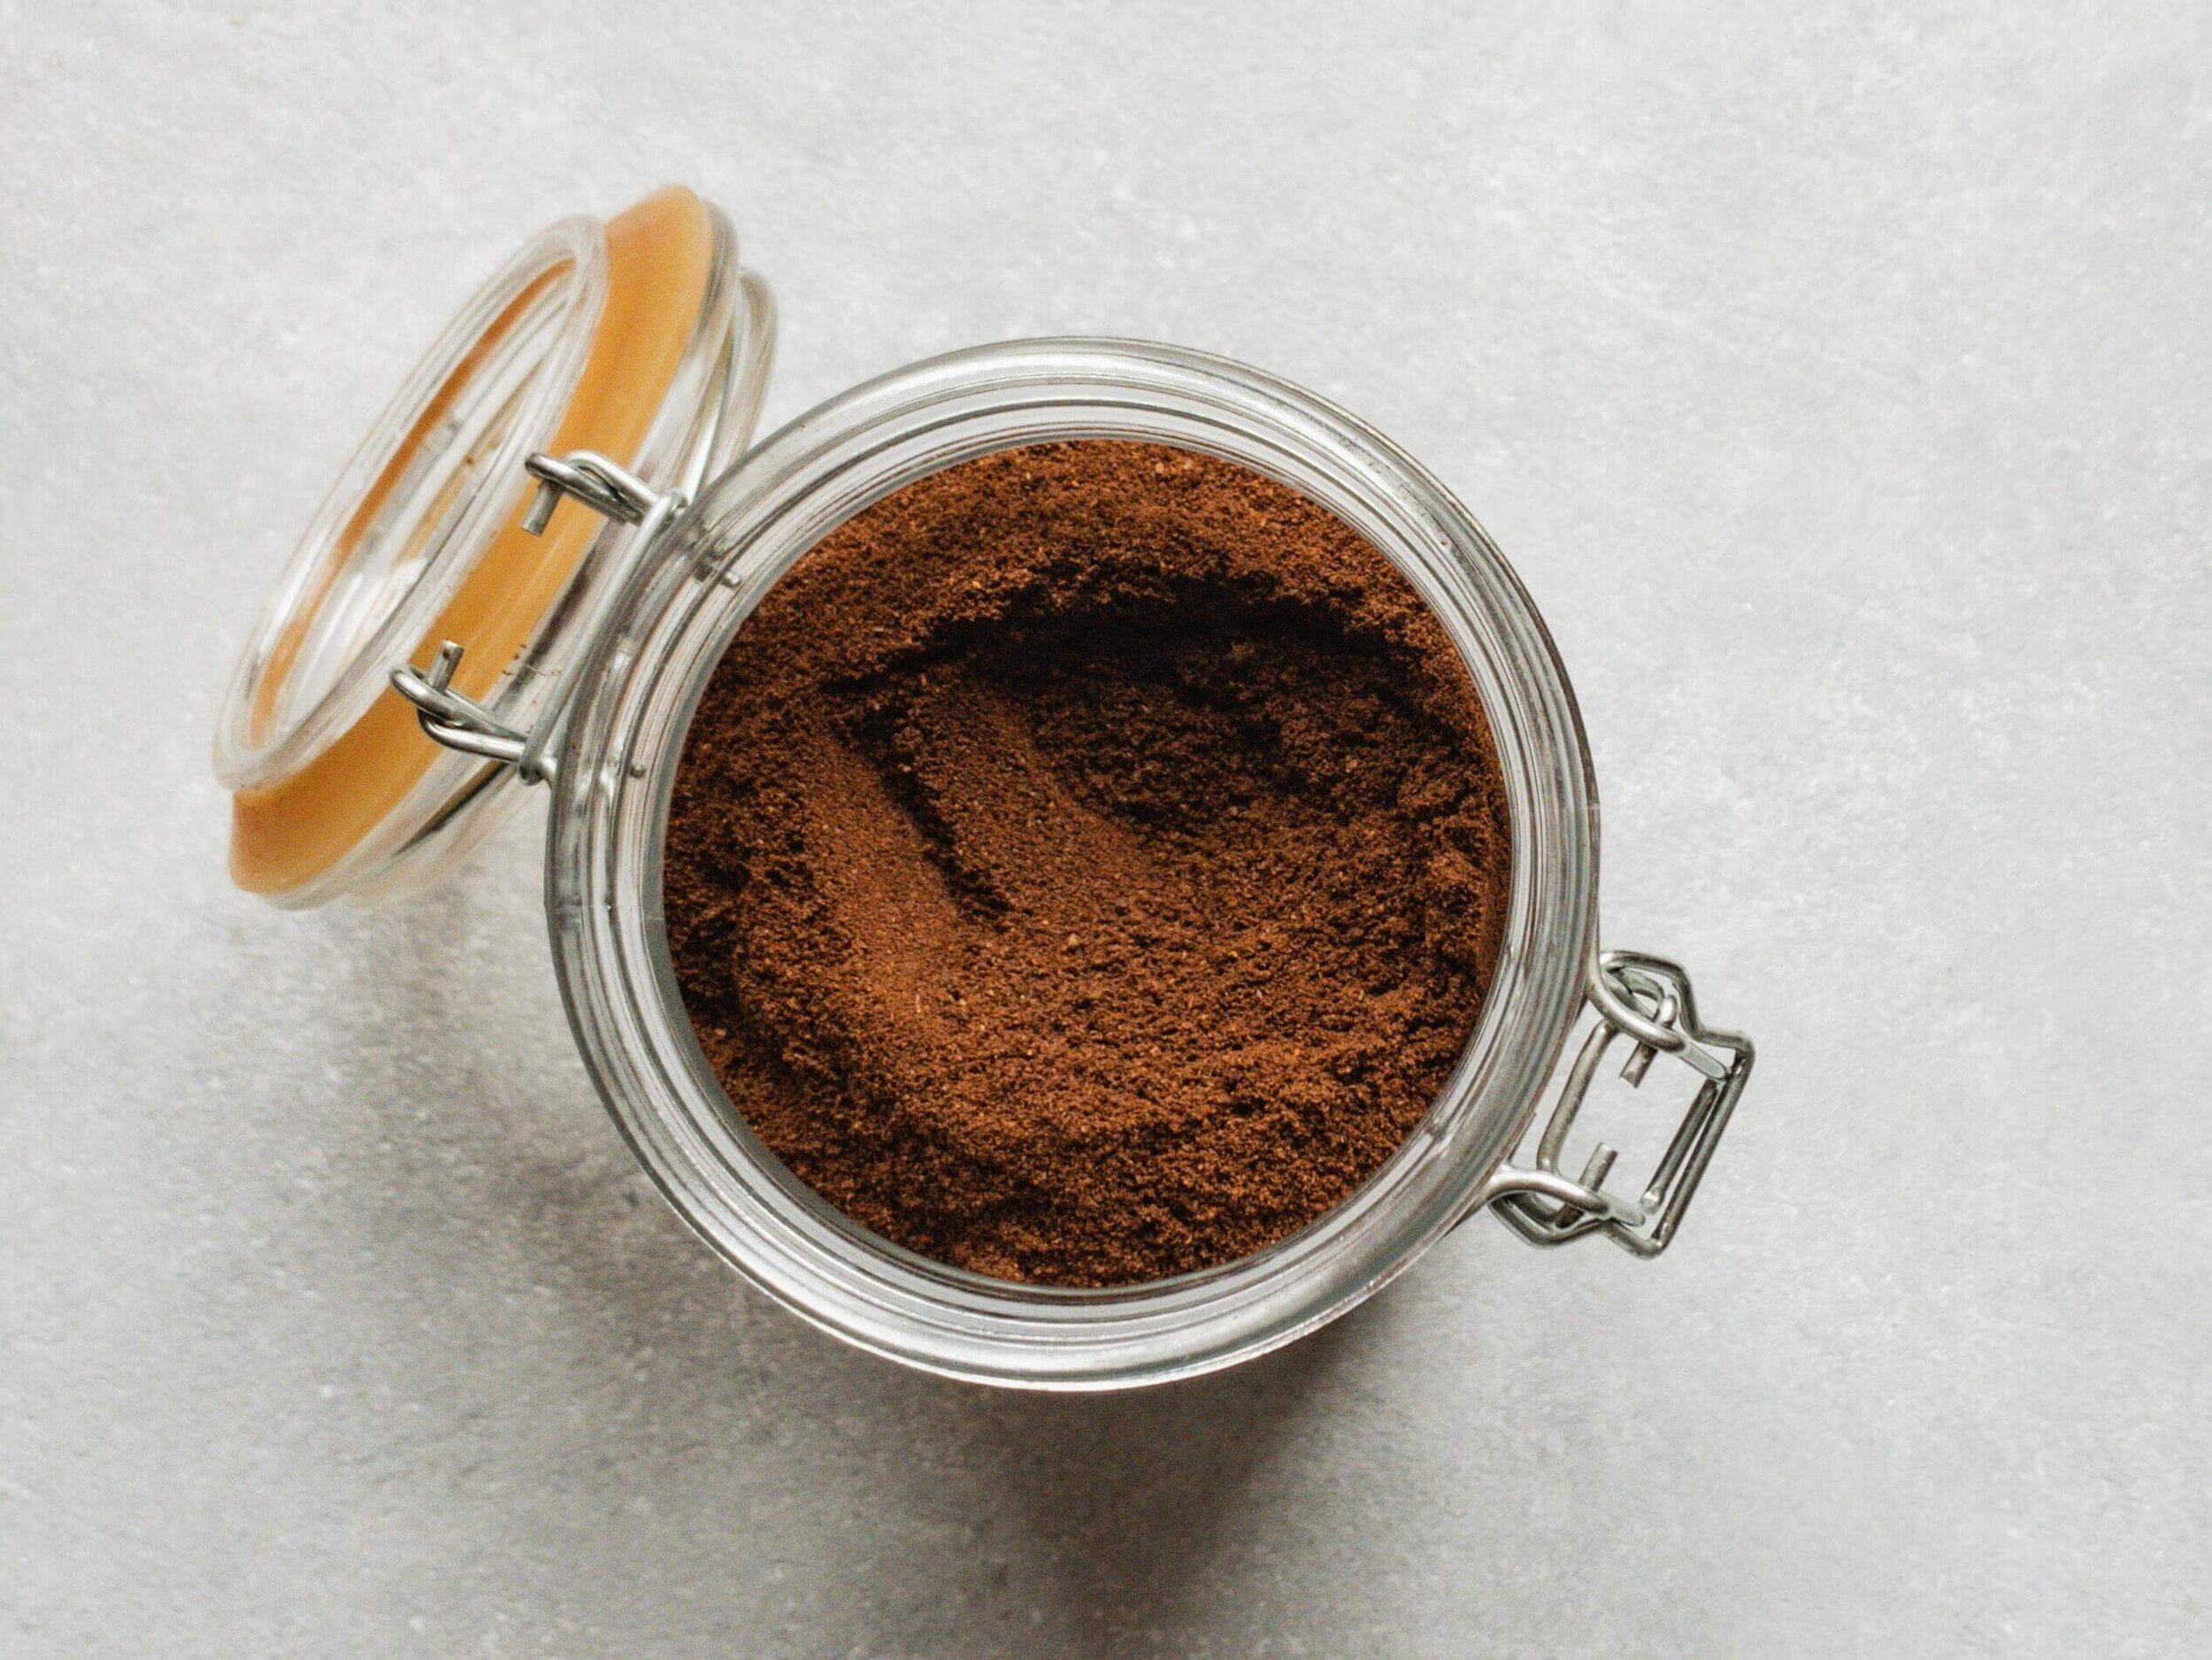 Antioxidant RIch Organic Cocoa Powder